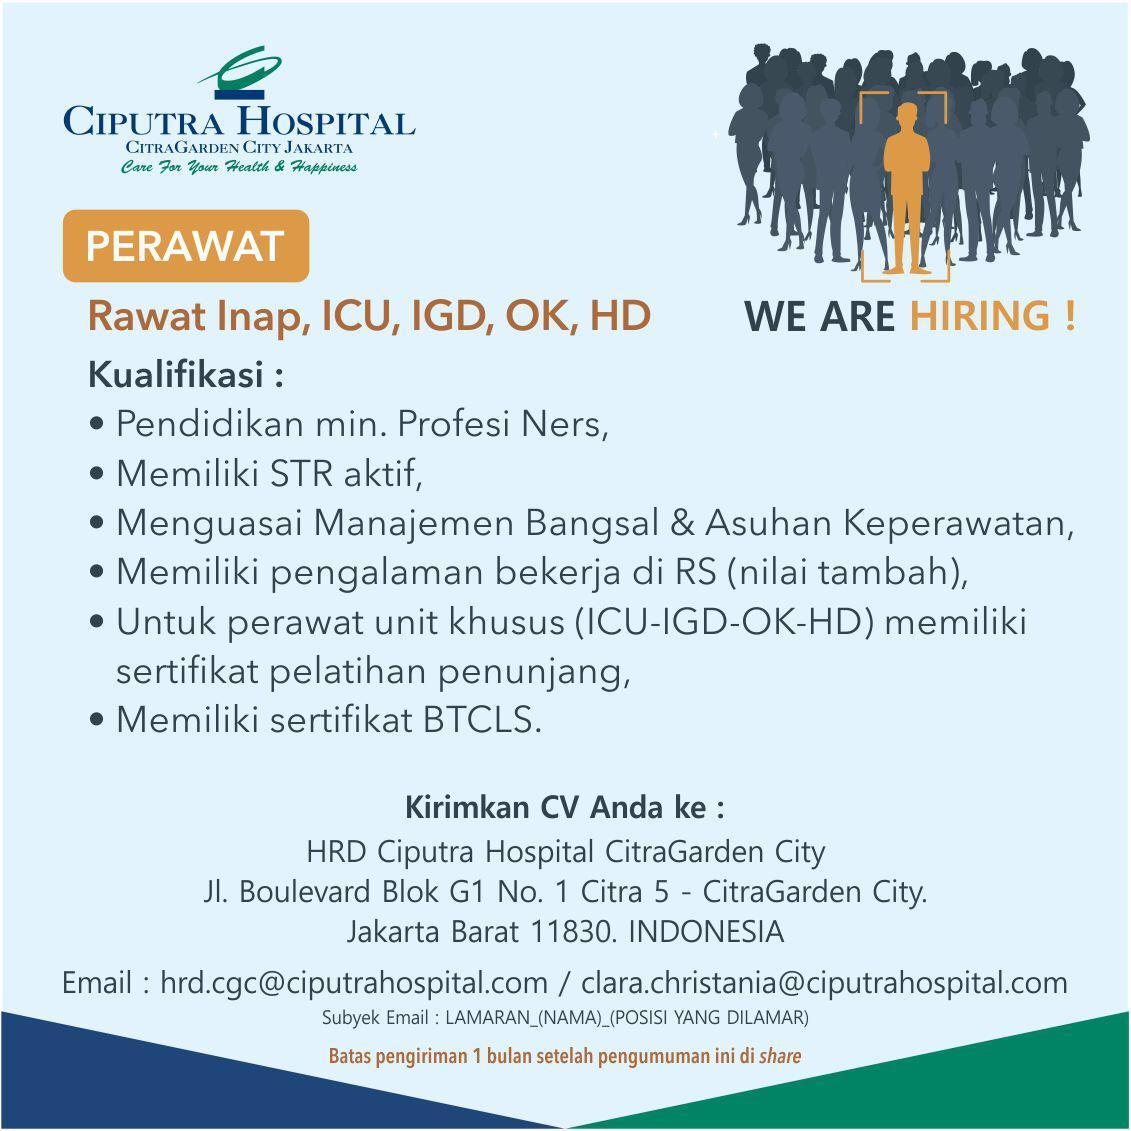 Lowongan Pekerjaan Ciputra Hospital CitraGarden City